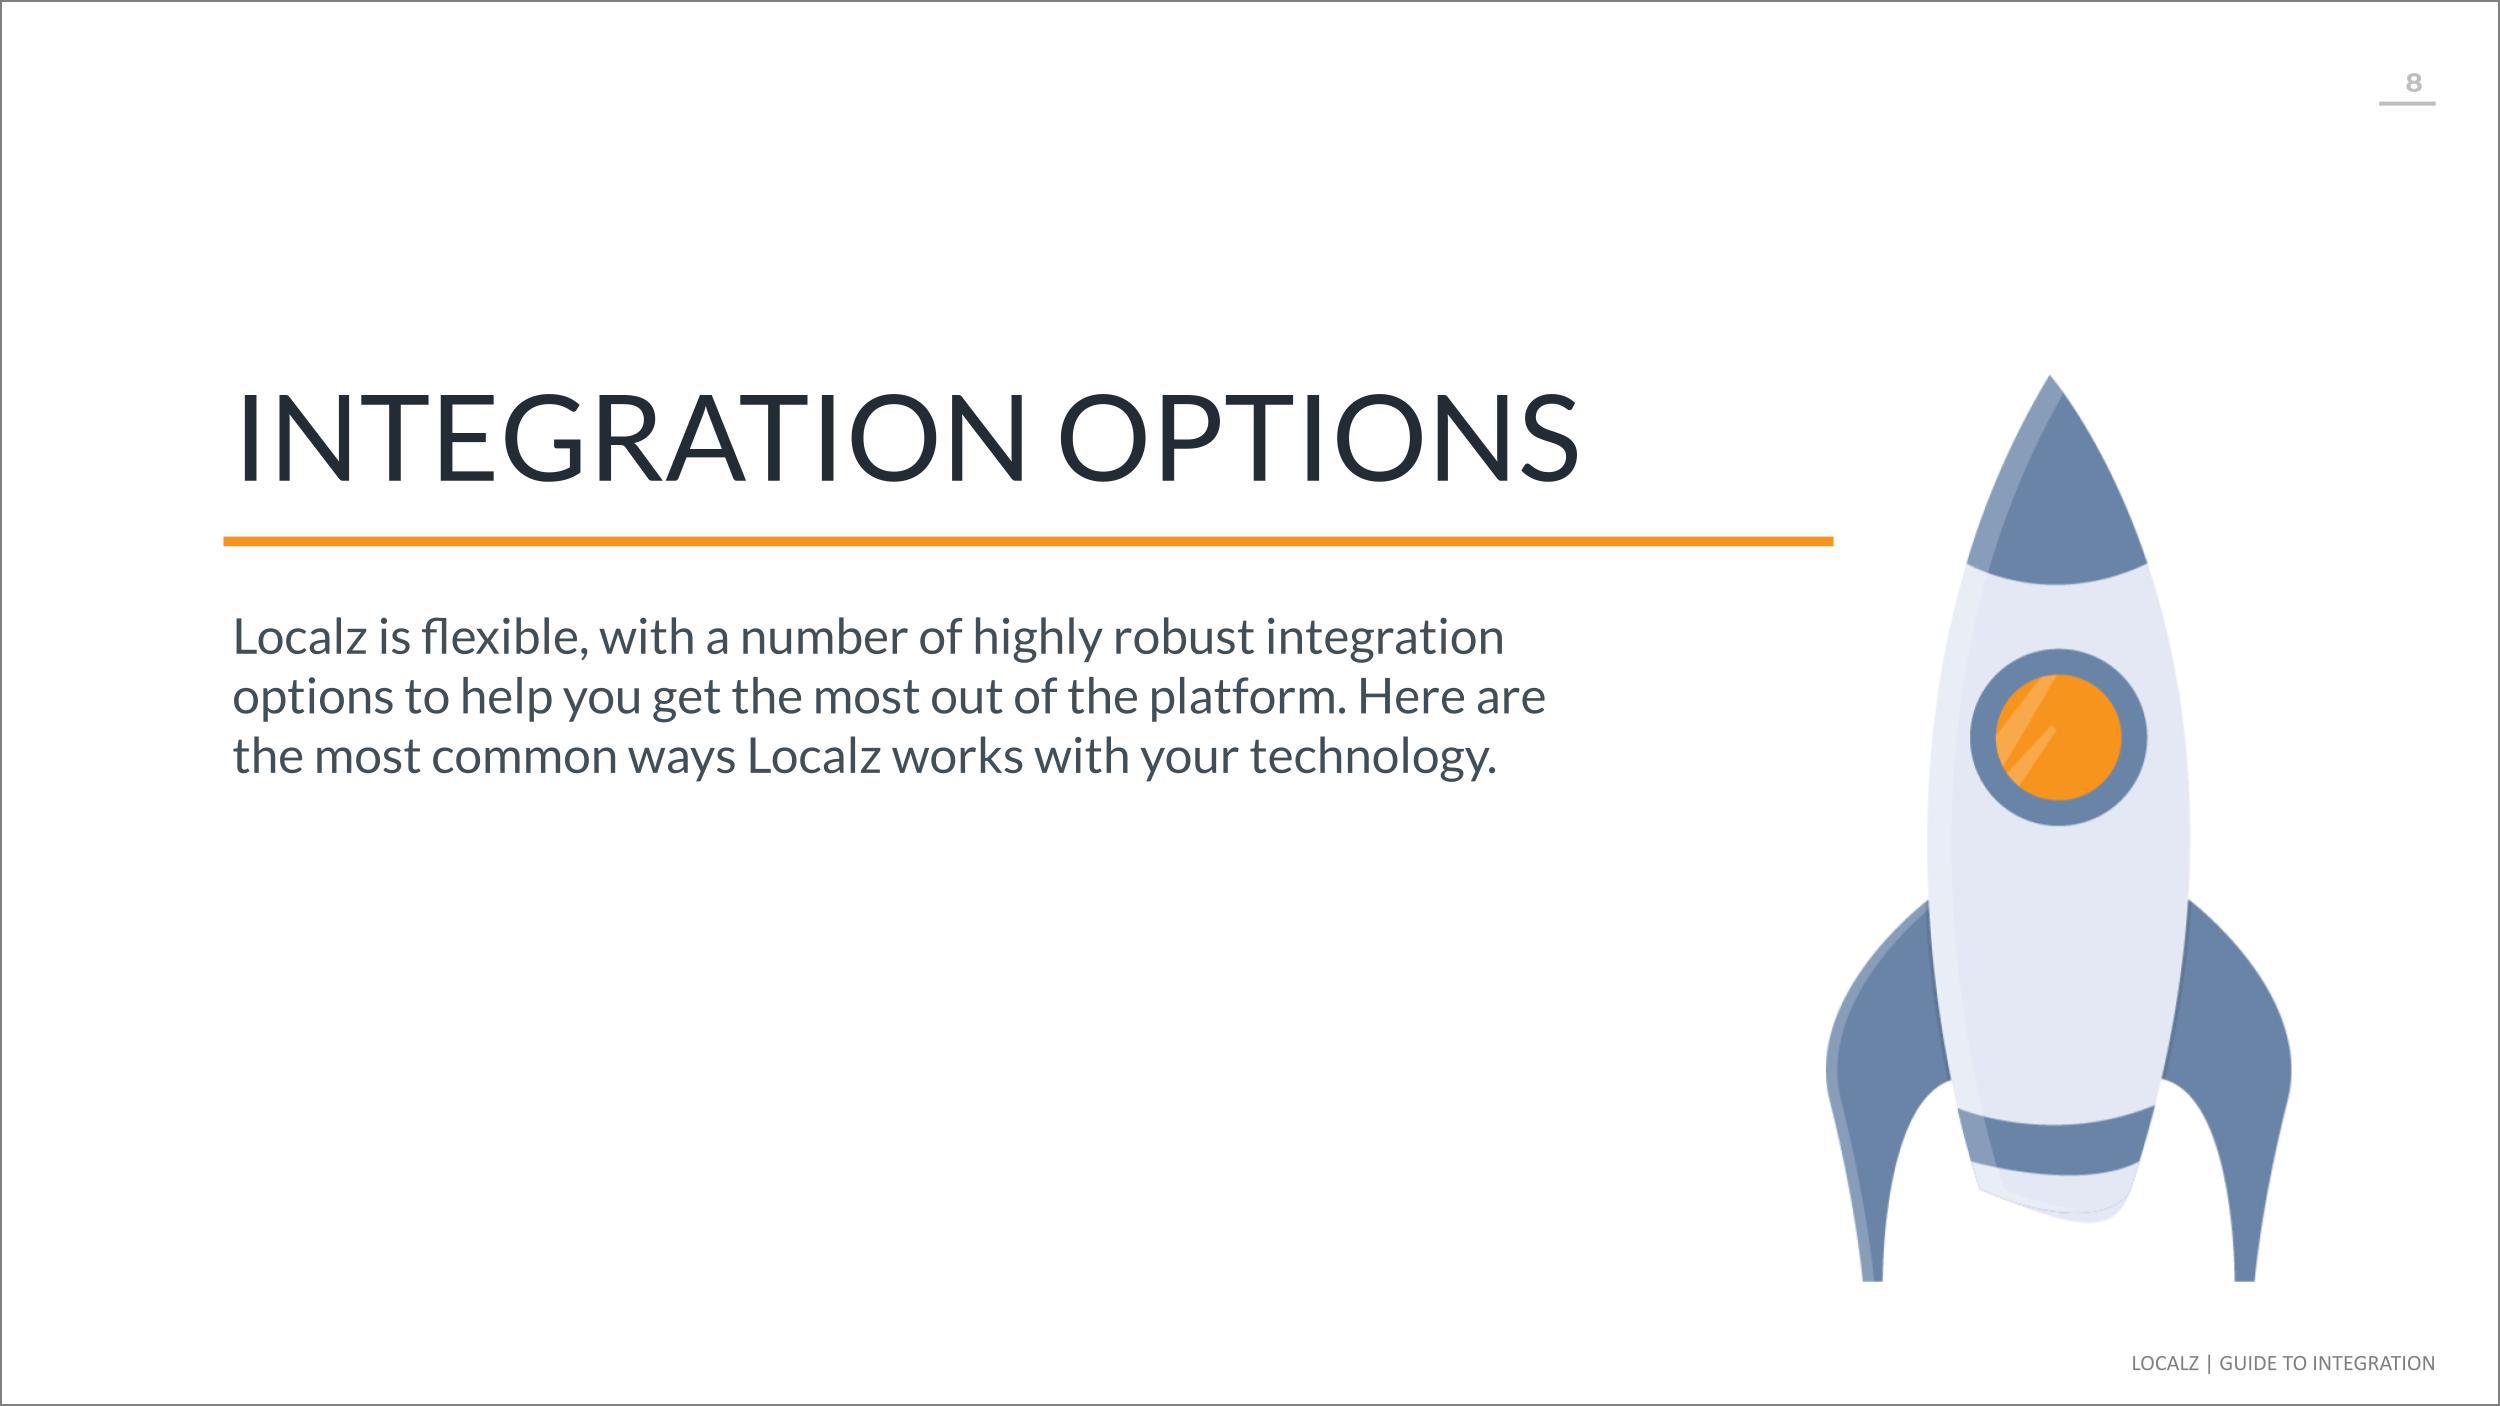 Localz integration options